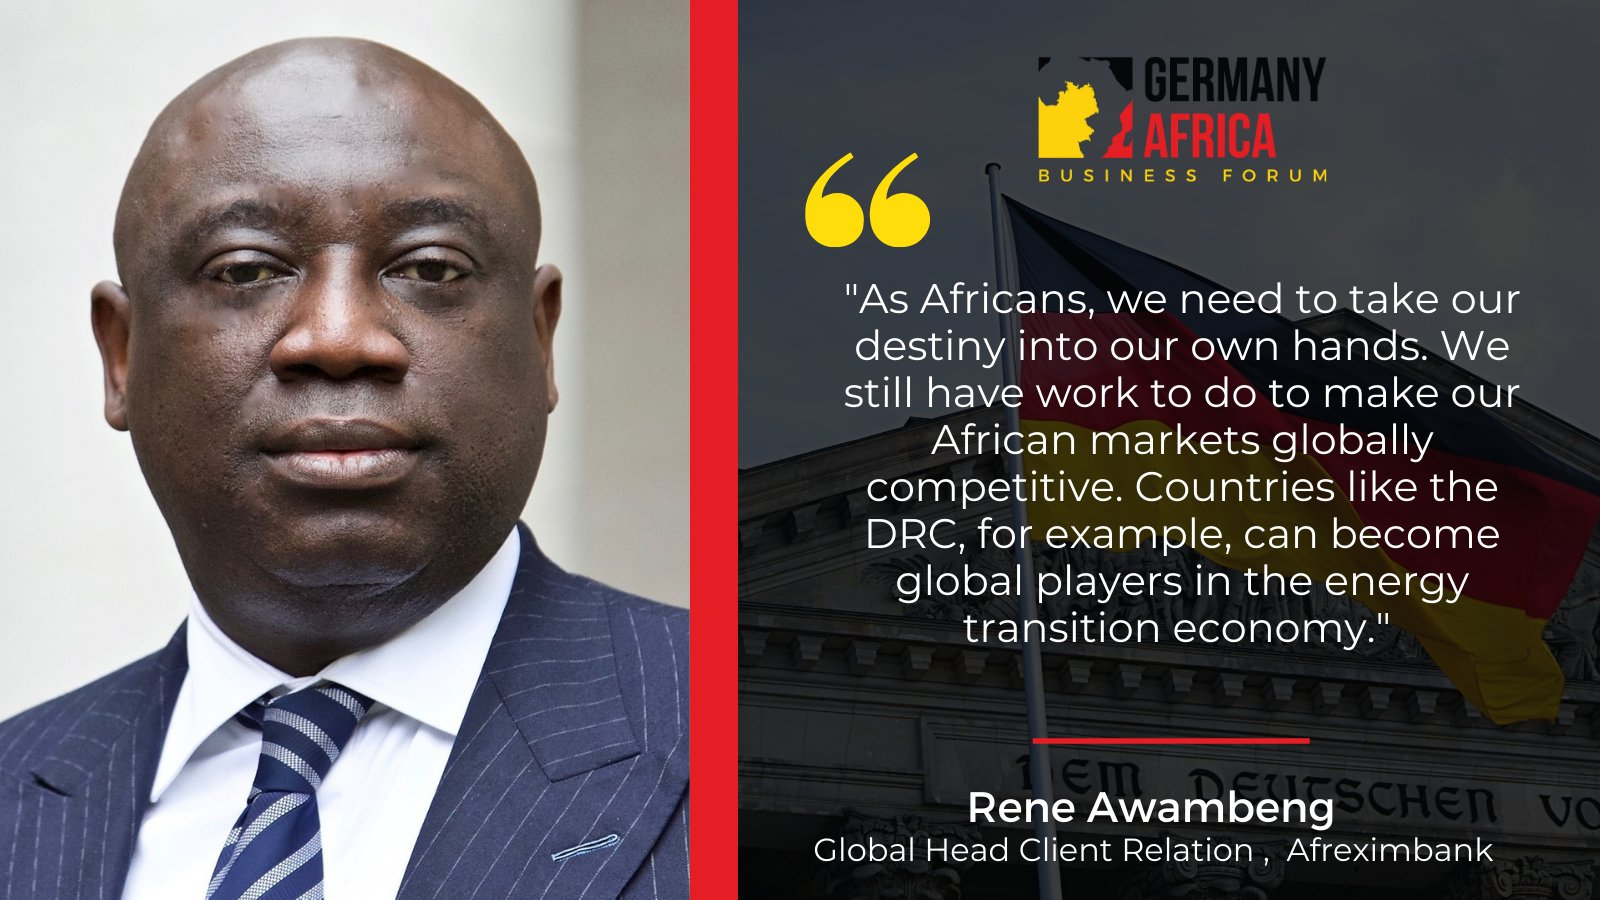 Awambeng, Global Head Client Relationship at the African Export-Import Bank (Afreximbank)